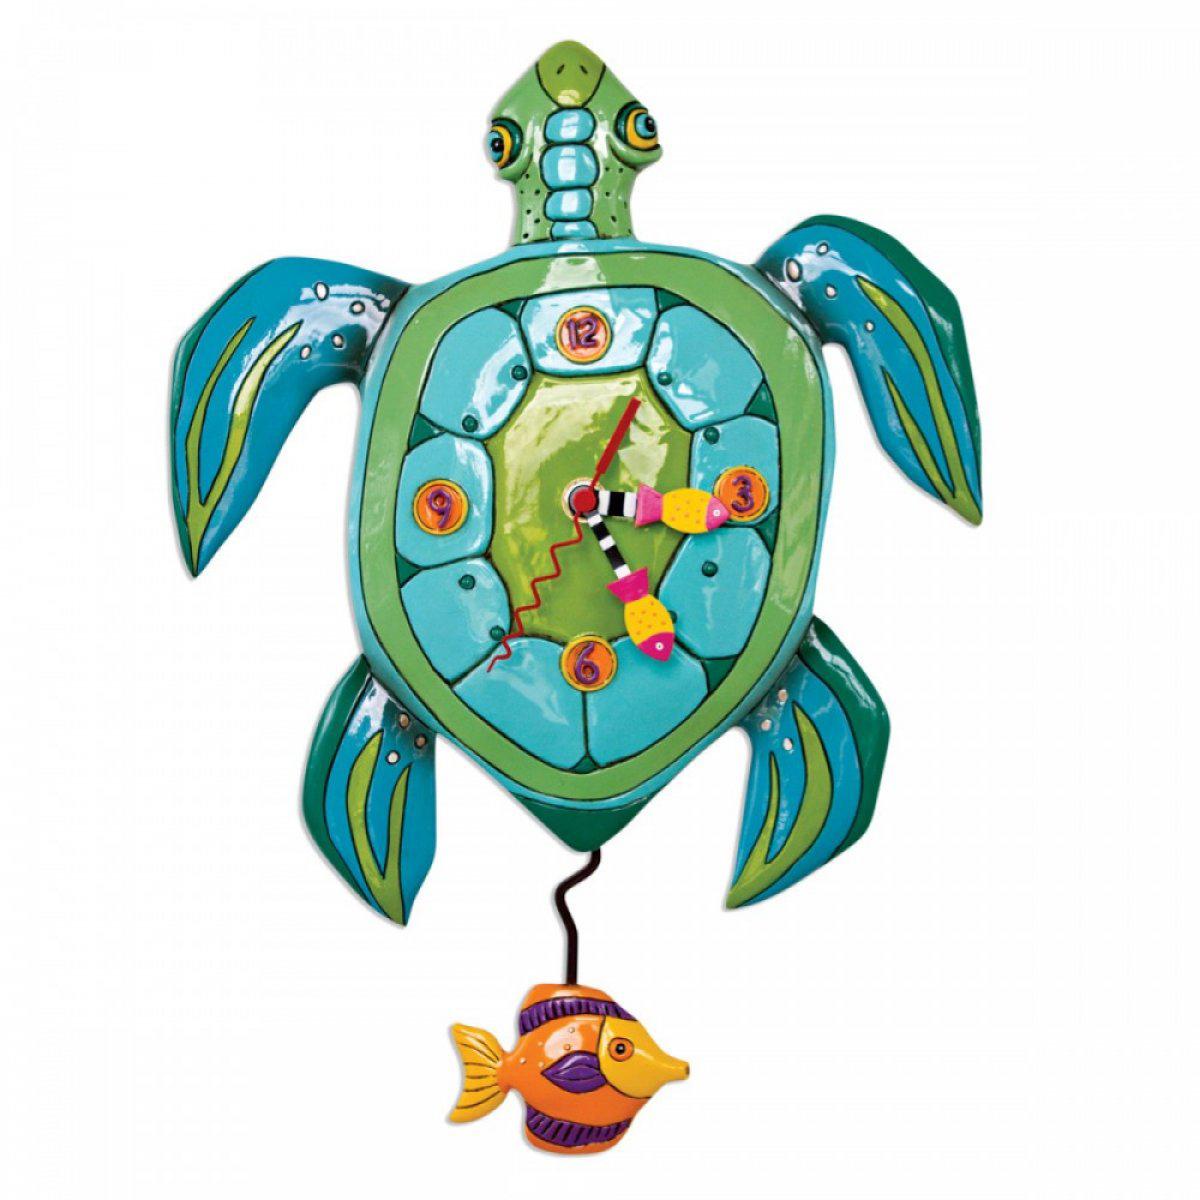 Horloge Murale \'Allen Designs\' turquoise (tortue) - 35x25 cm - [A1979]